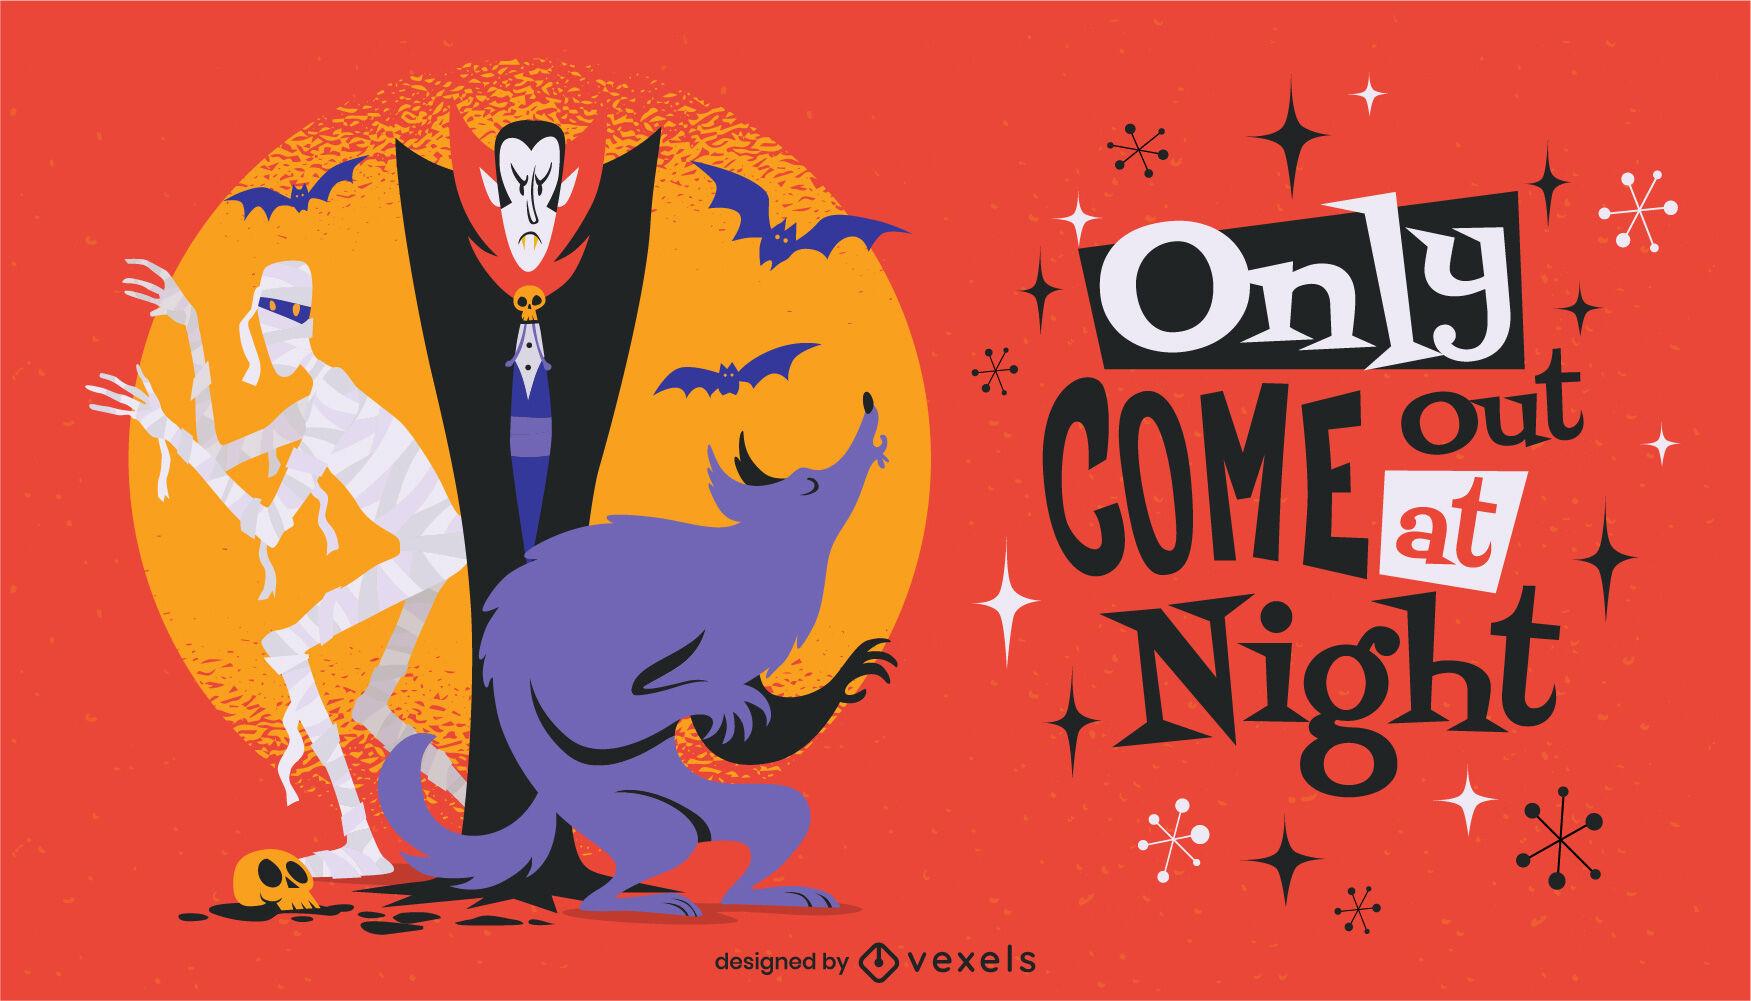 Personajes de monstruos de dibujos animados de Halloween